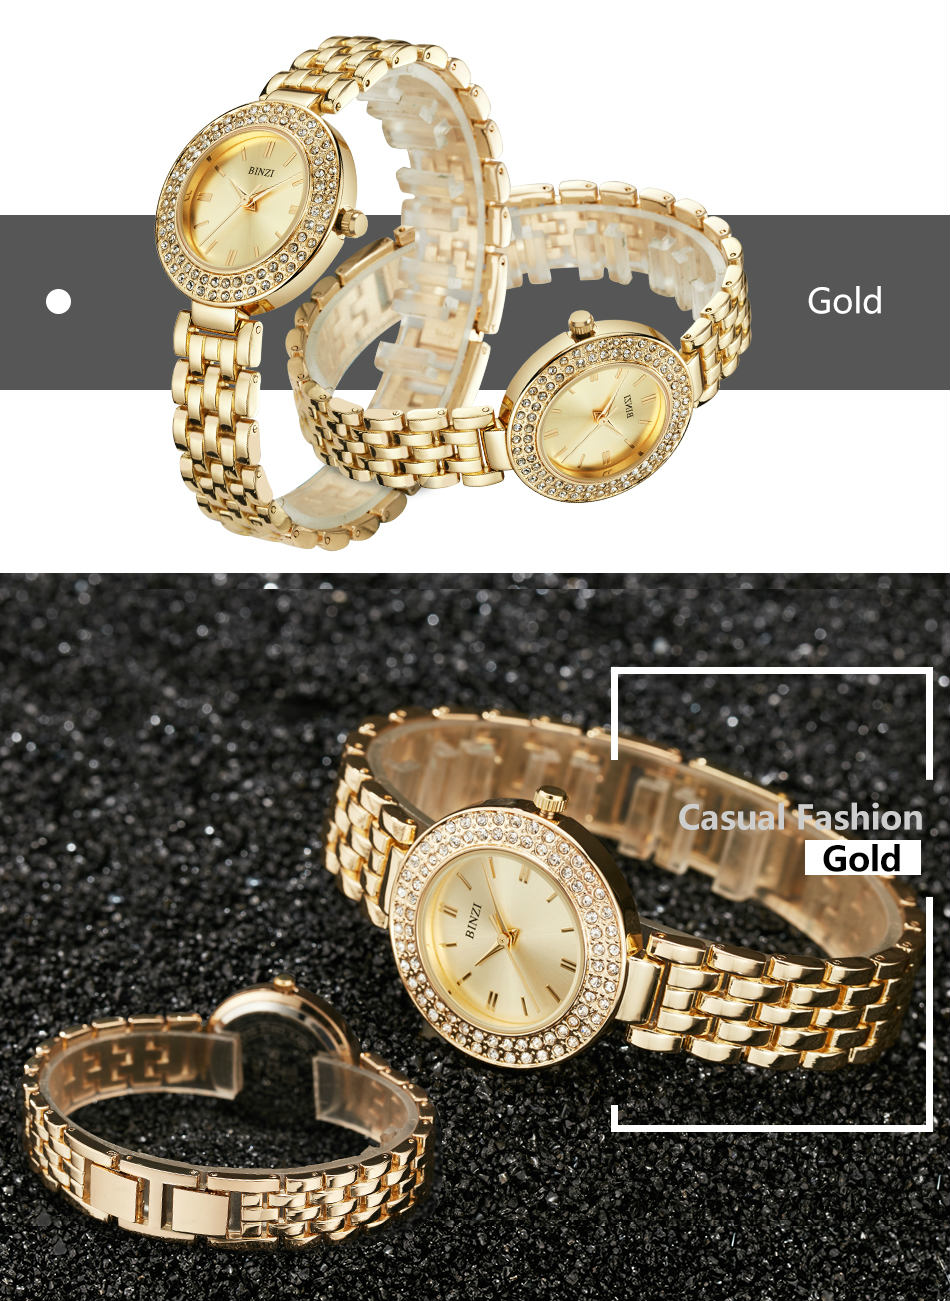 womens-watch-rhinestone-ladies-wrist-watches-2018-bracelet-watch-expensive-brand-clock-woman-female-wristwatches-2018 (3)